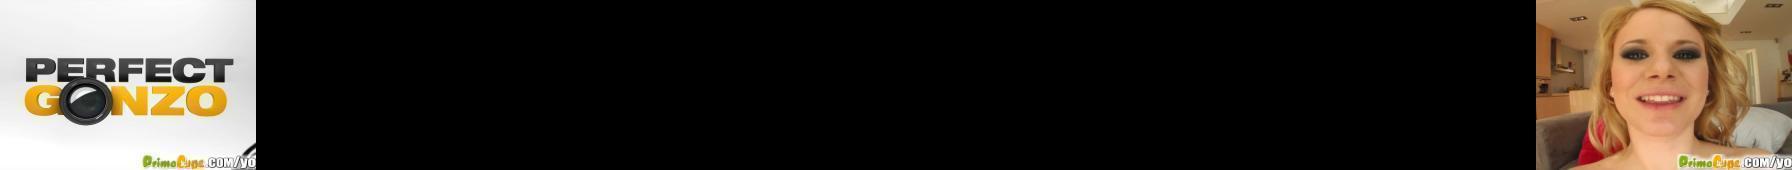 duża dupcia stworzona do ruchania